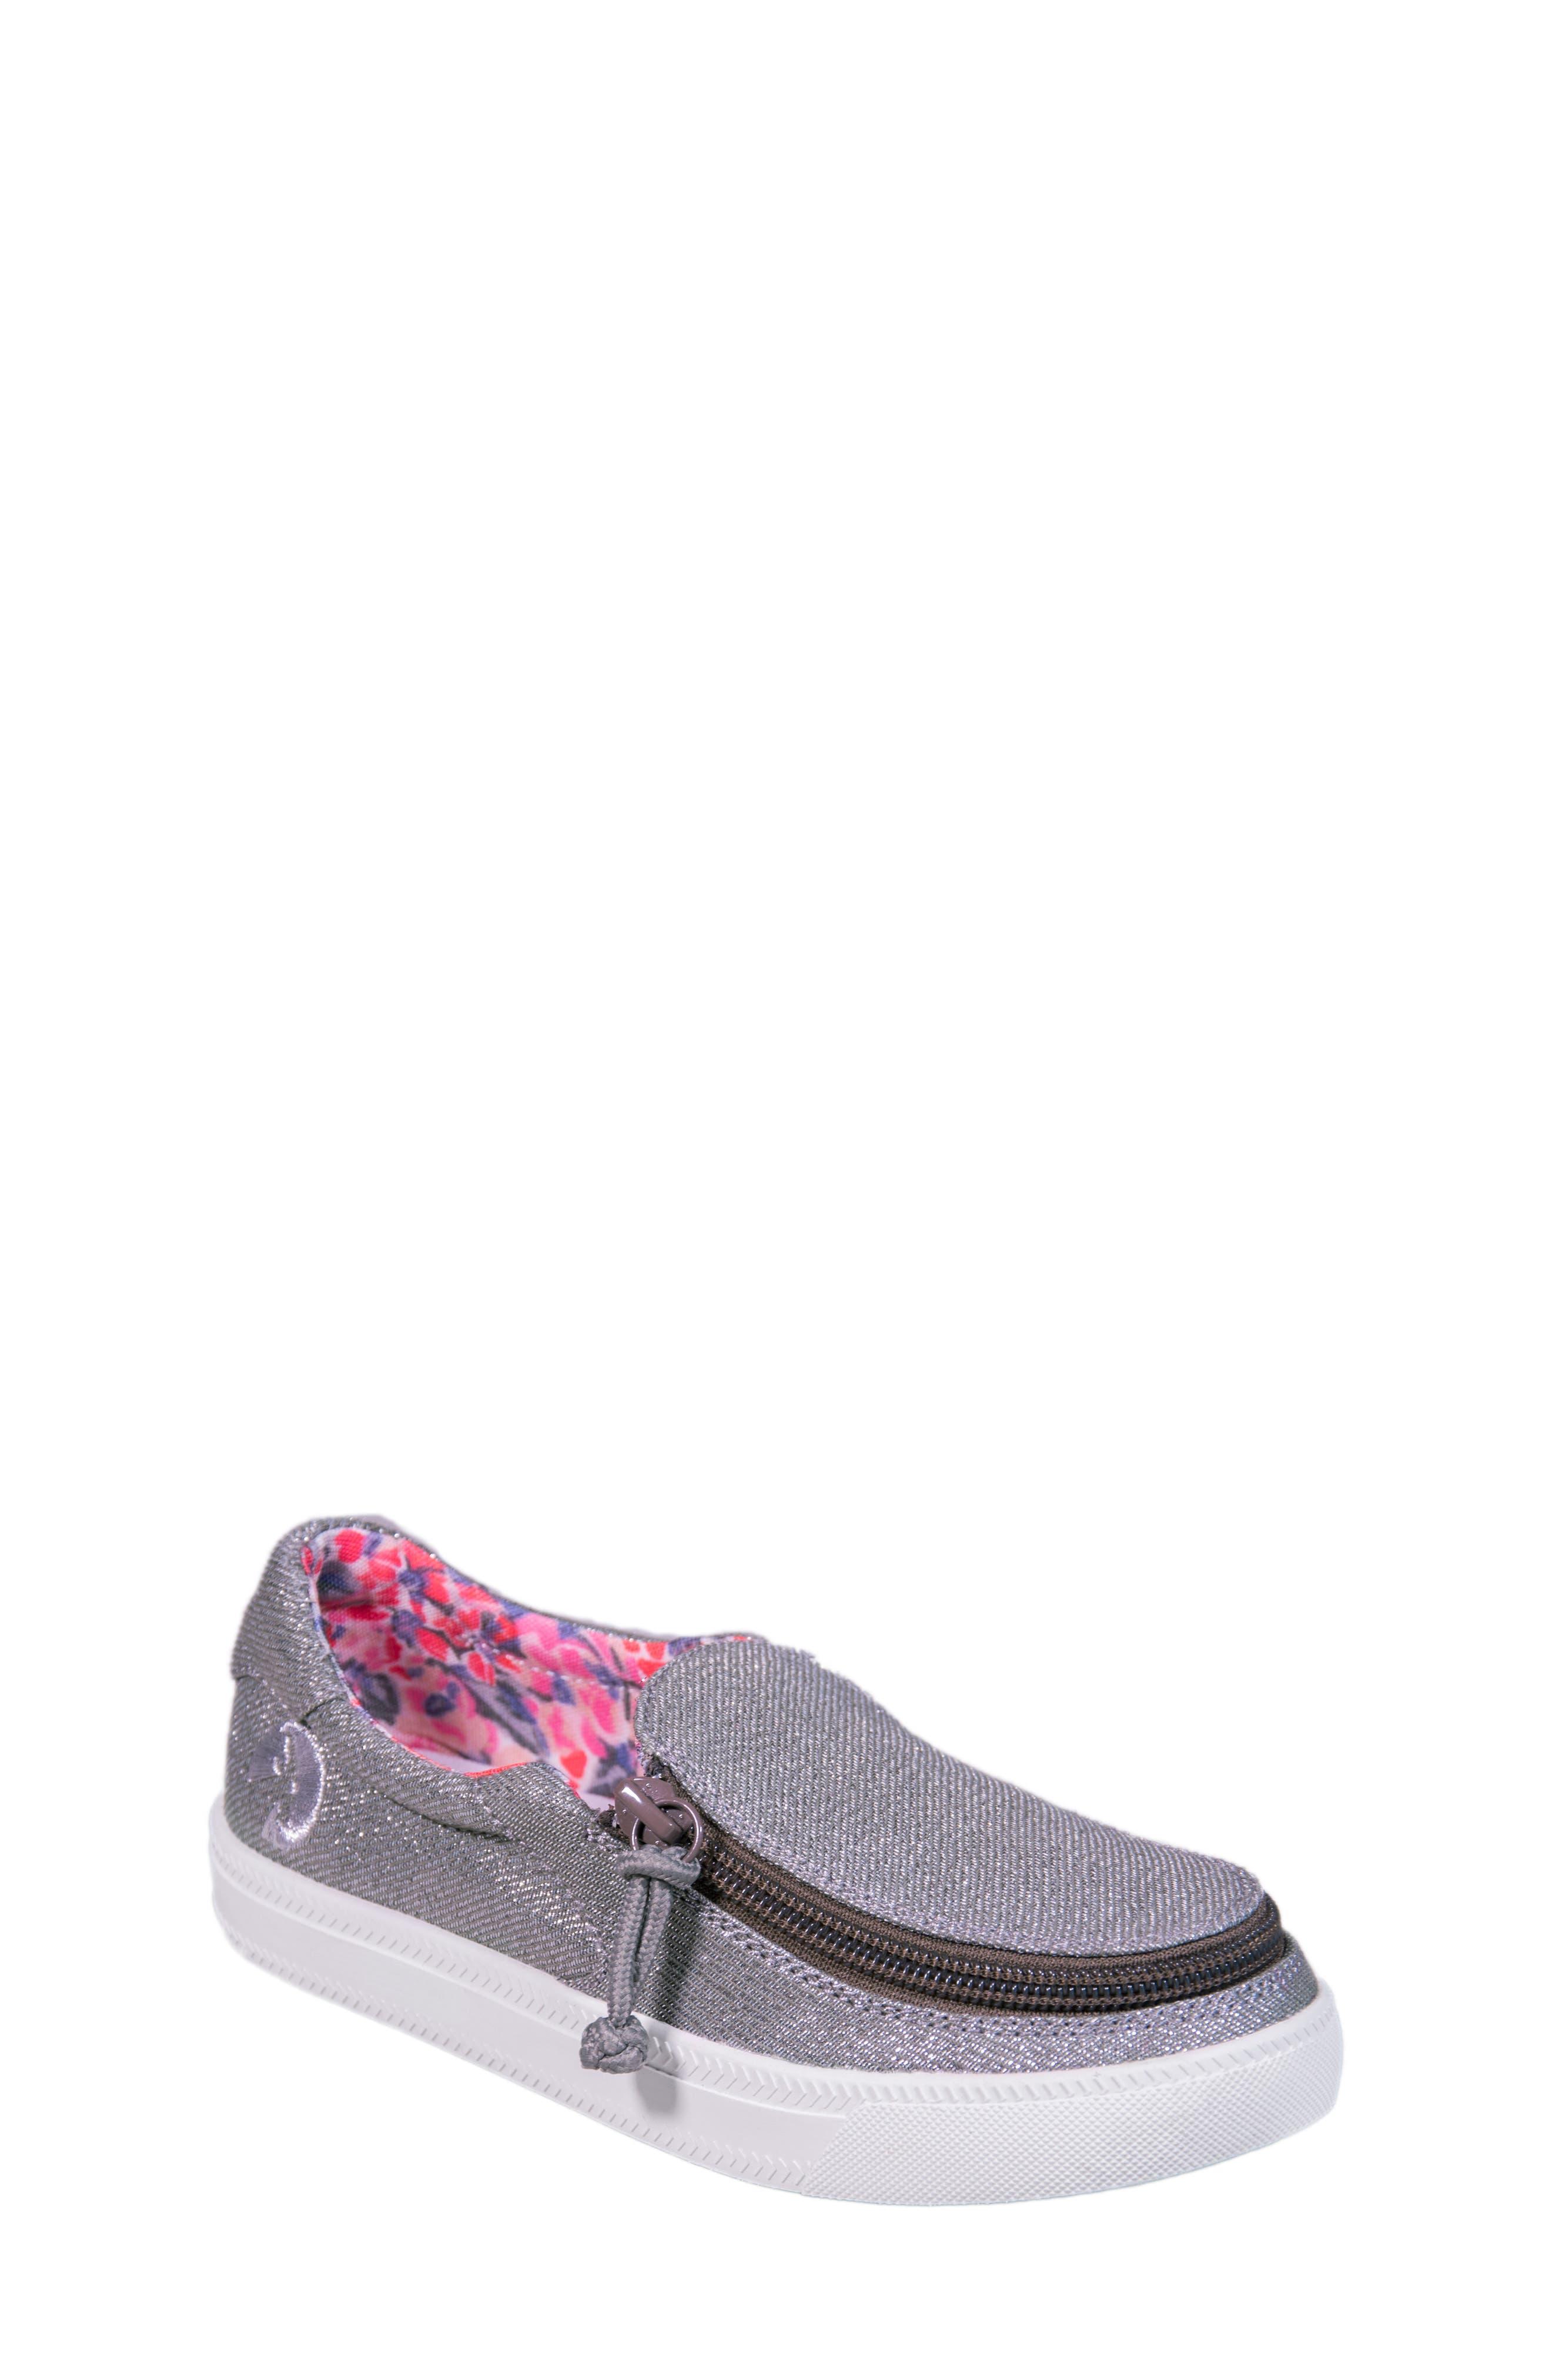 BILLY Footwear Zip Around Sparkly Low Top Sneaker (Toddler, Little Kid & Big Kid)